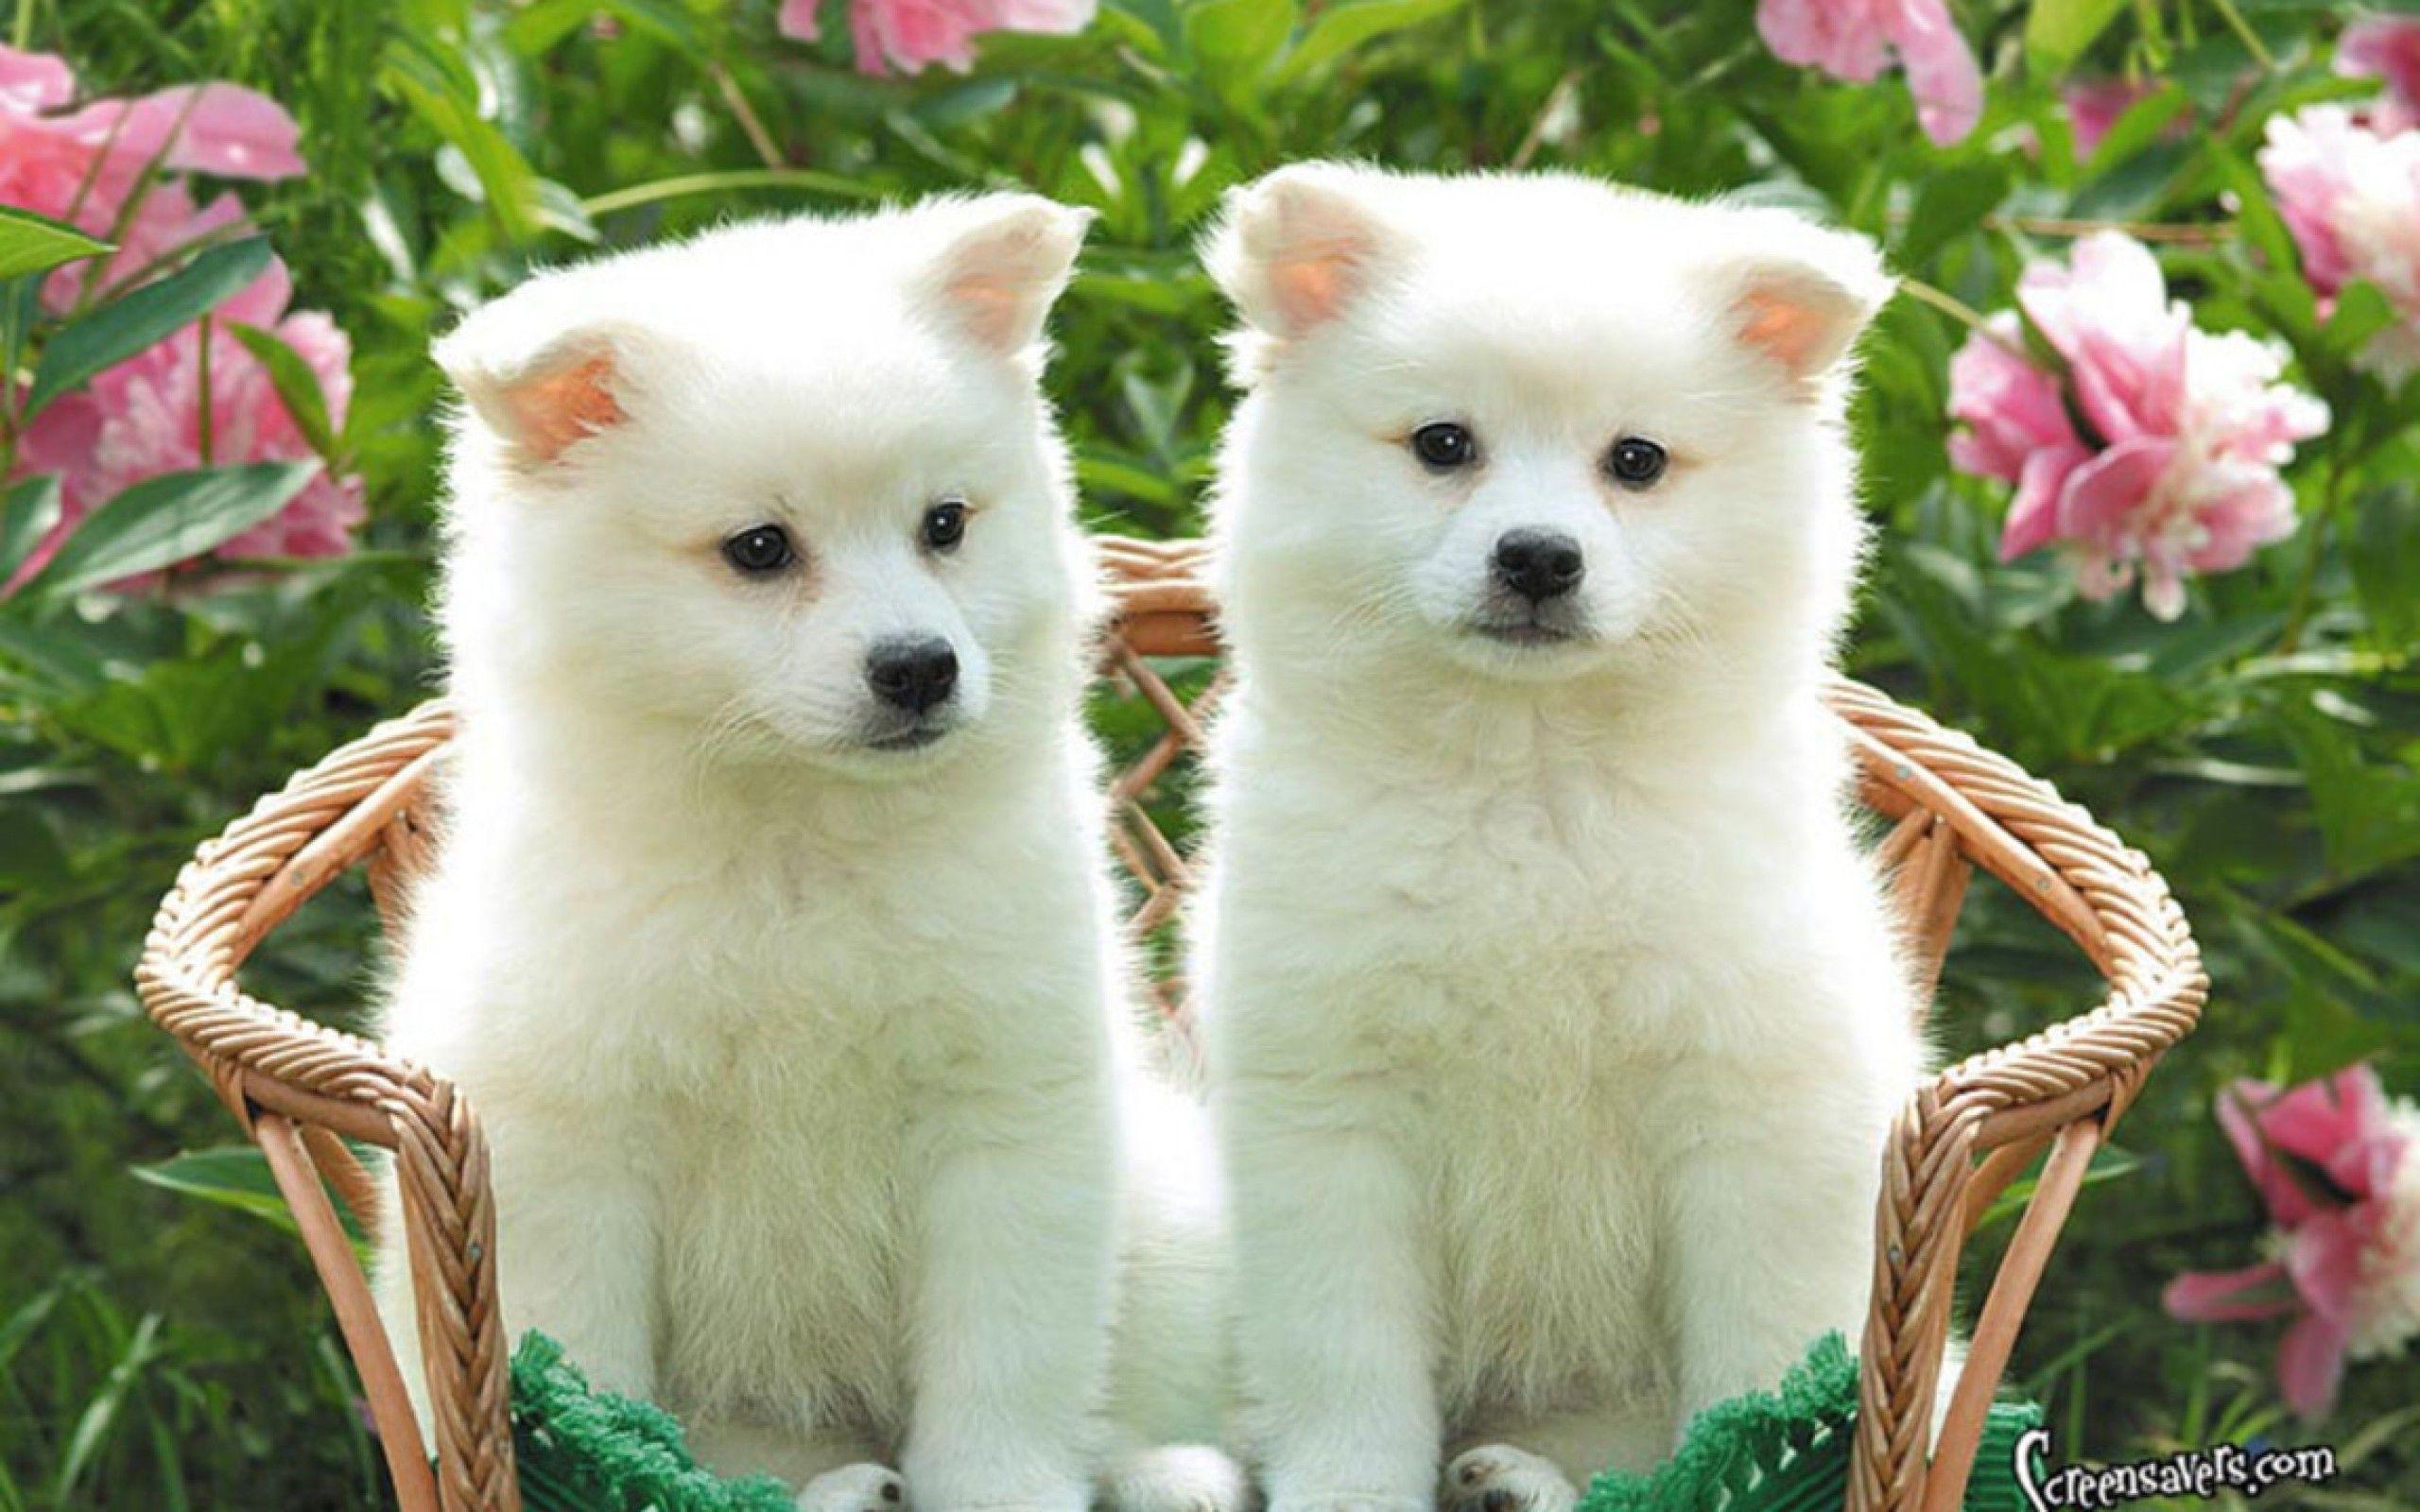 Wallpaper download cute - Puppies Hd Wallpapers Hd Wallpapers